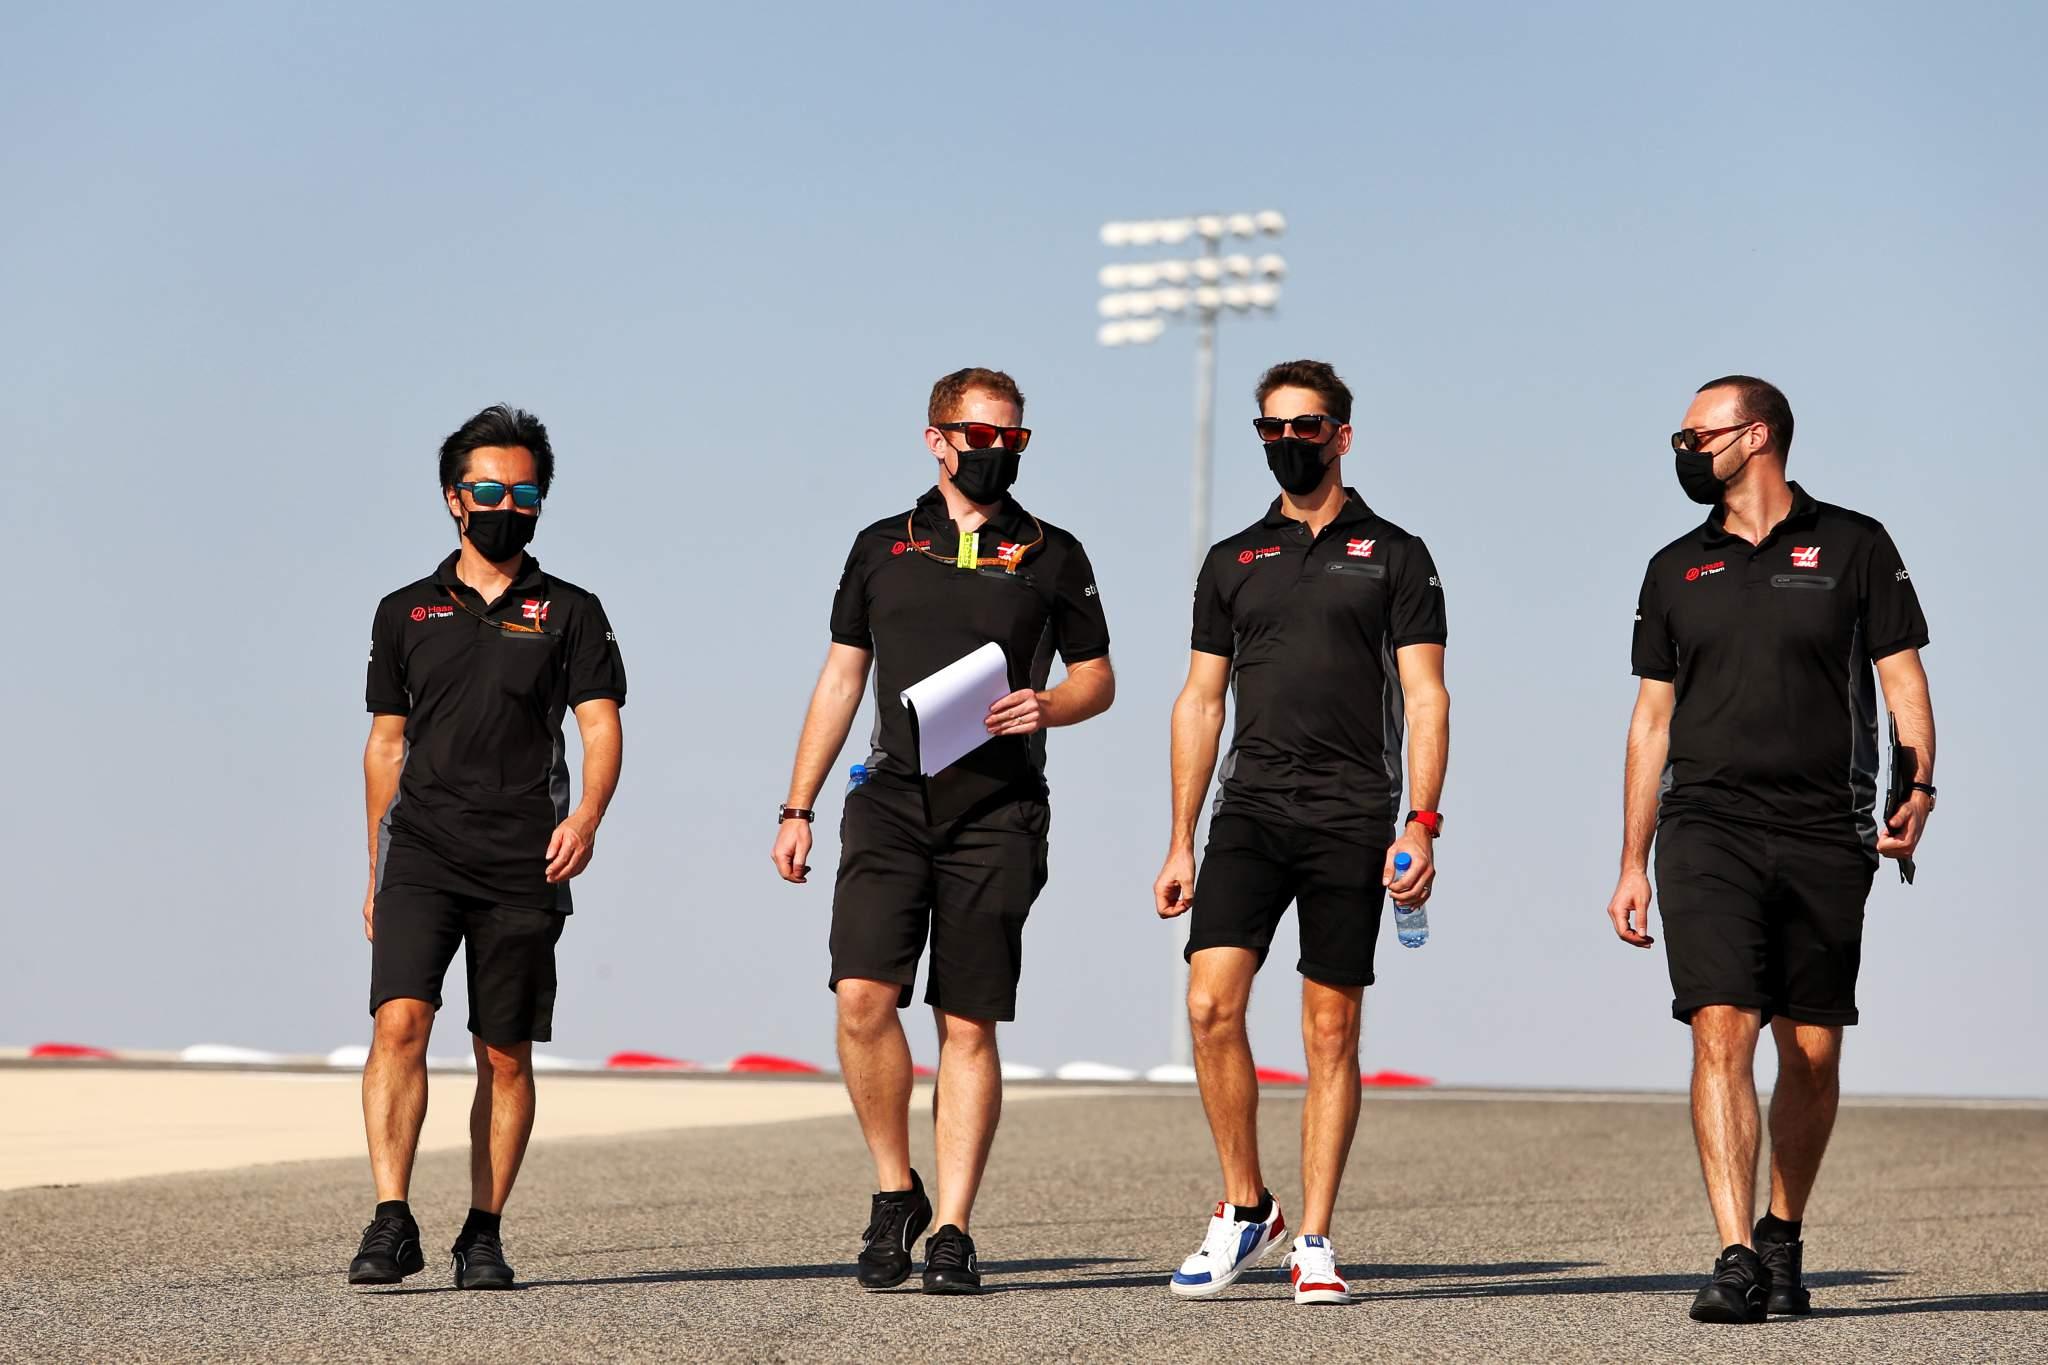 Motor Racing Formula One World Championship Bahrain Grand Prix Preparation Day Sakhir, Bahrain